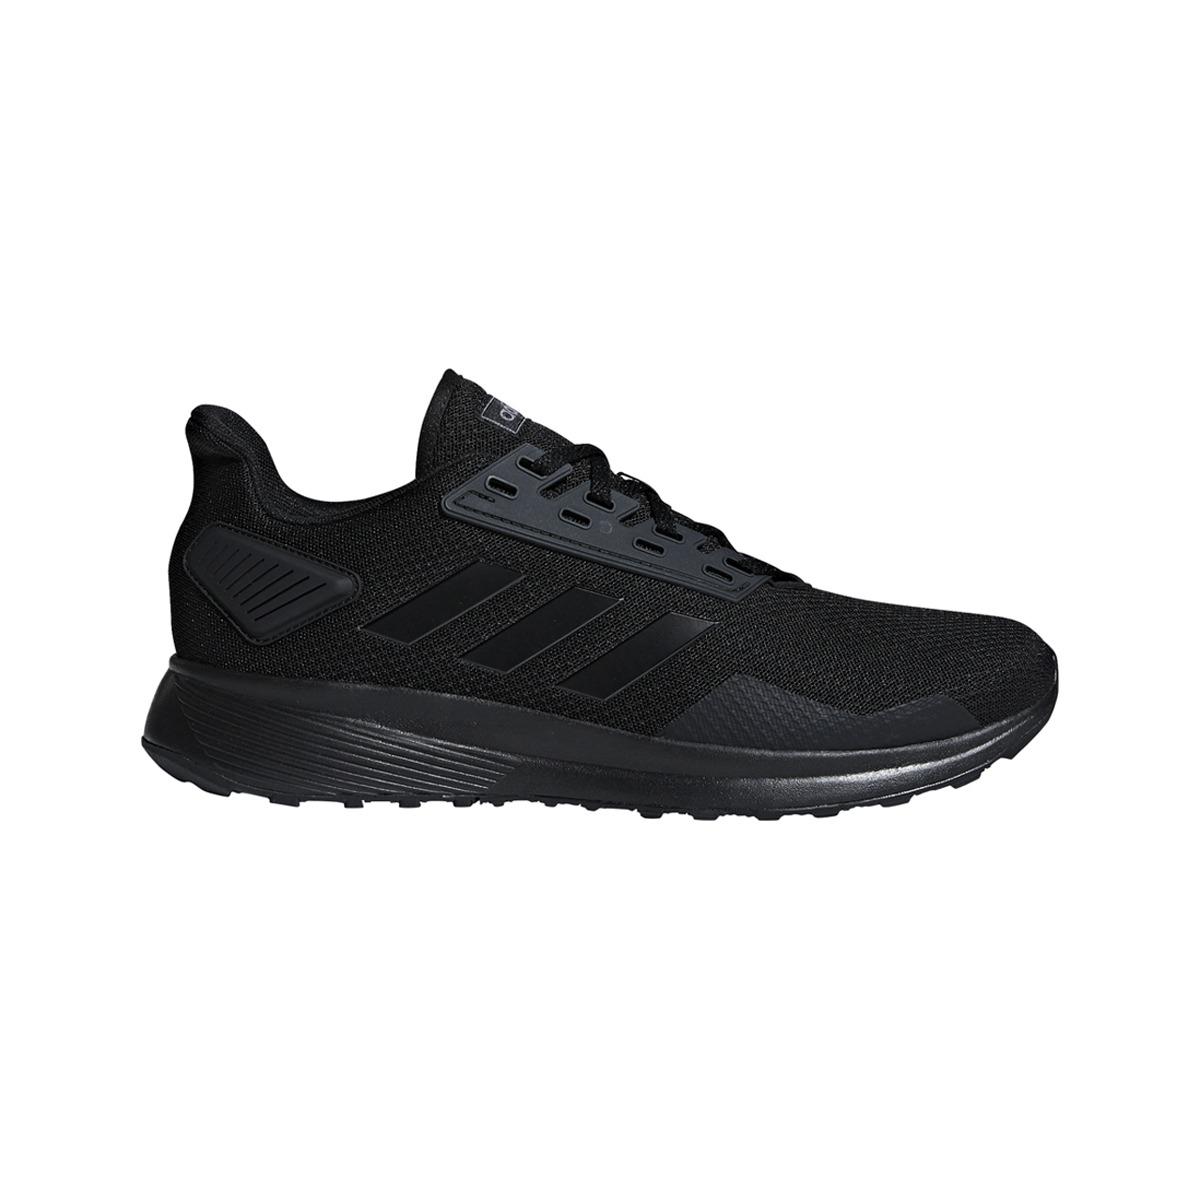 ee3d92b1037ca zapatillas adidas running duramo 9 hombre ng ng. Cargando zoom.